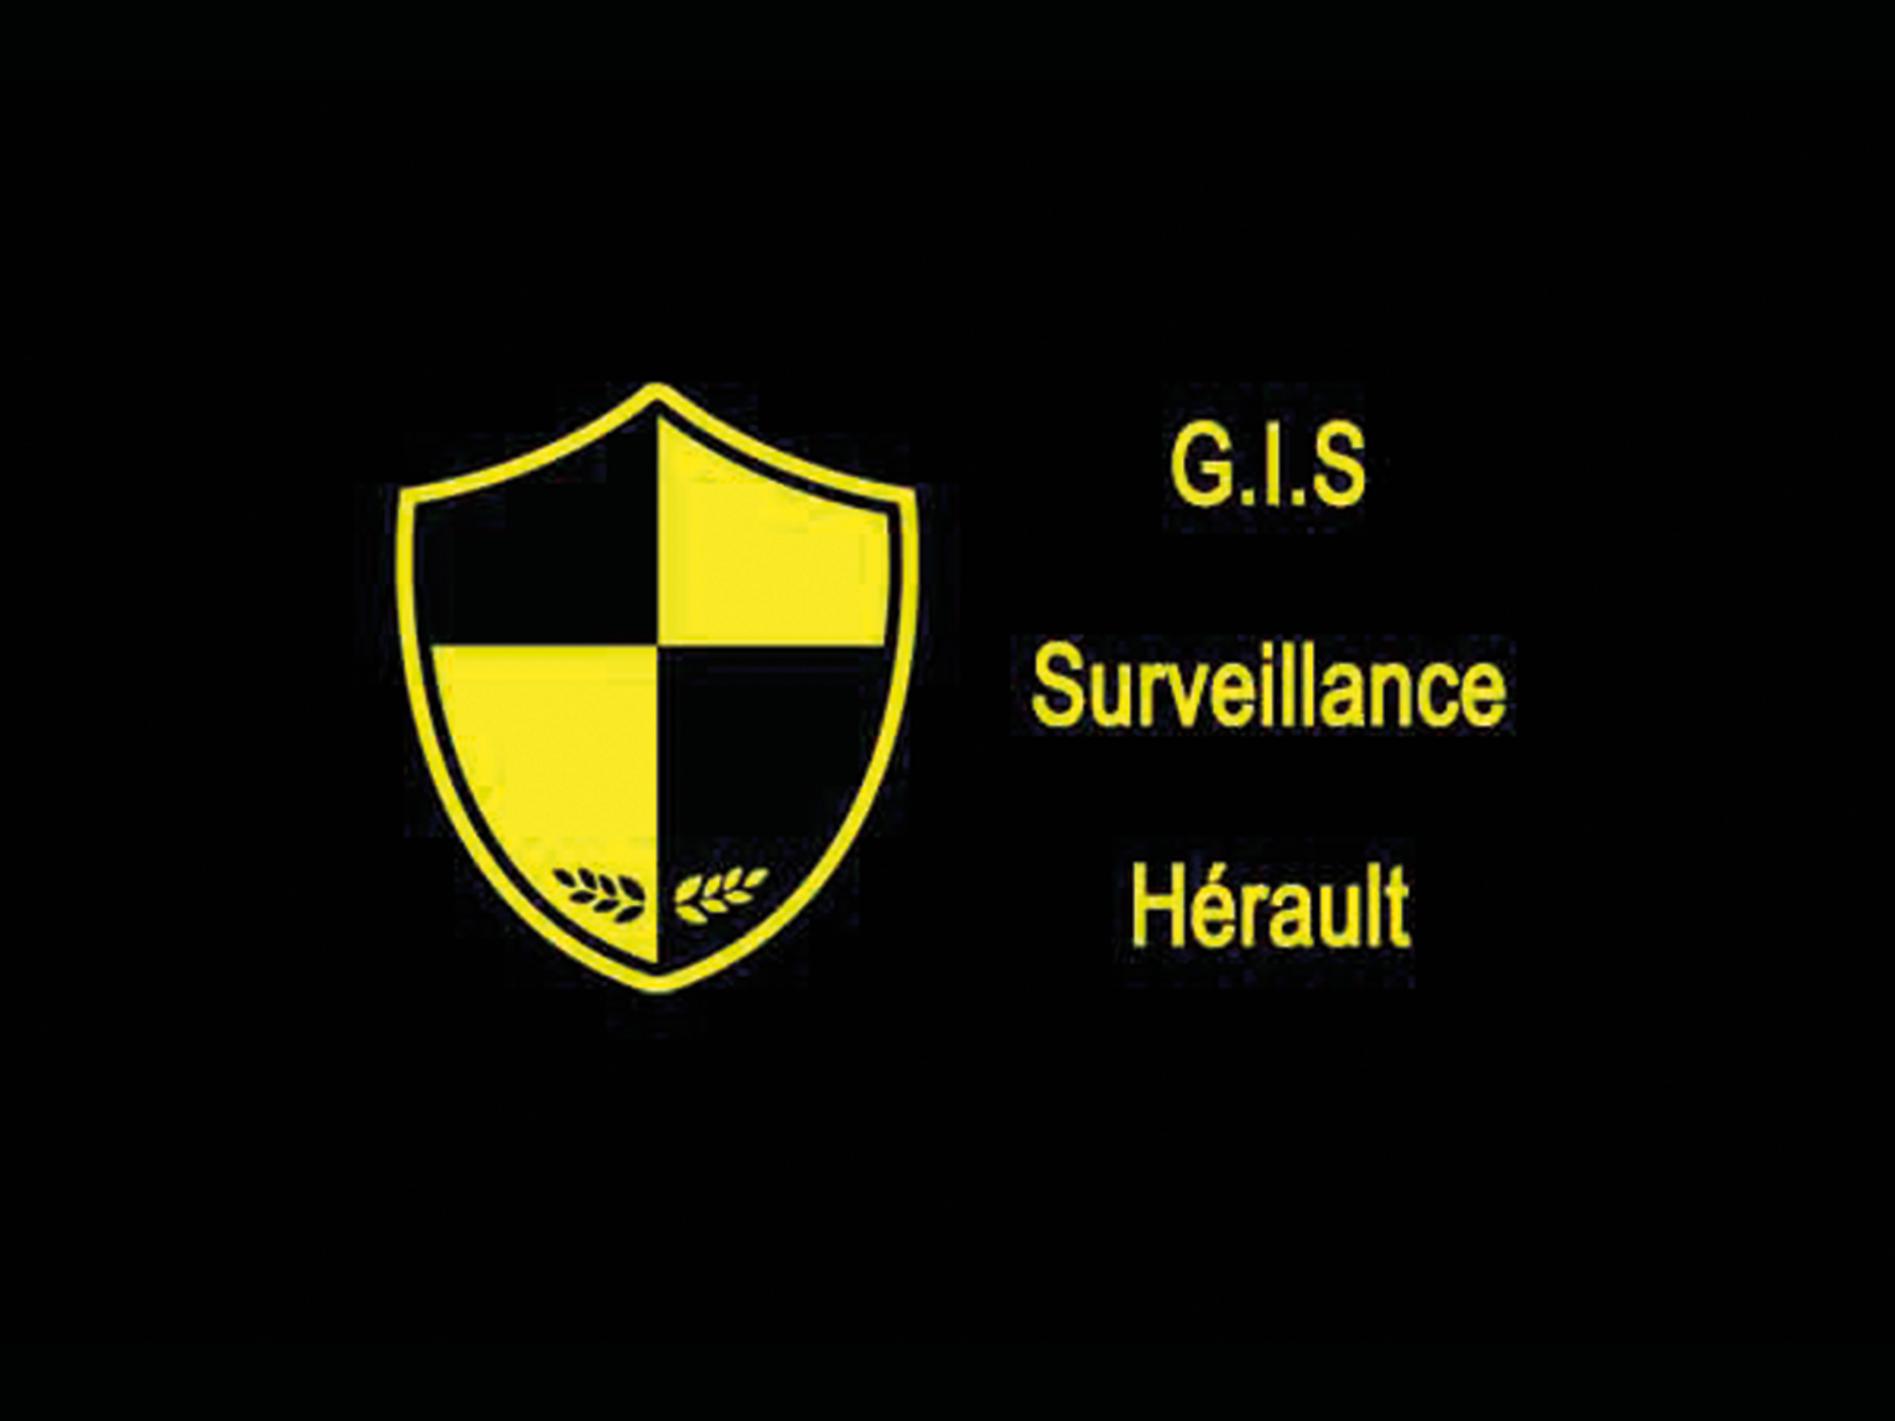 gis-surveillance